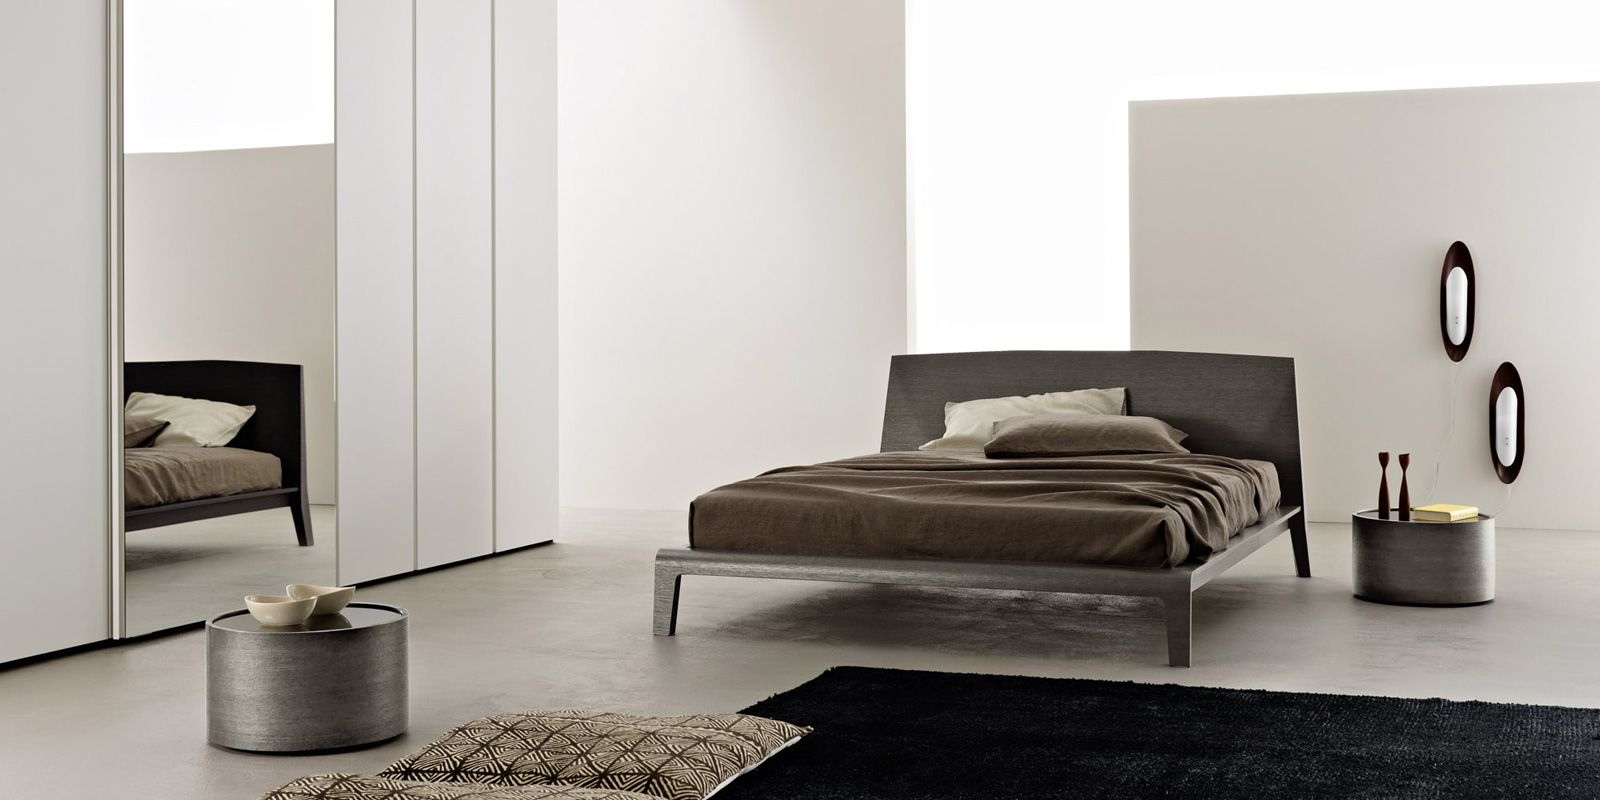 Cloe Bed By Sangiacomo